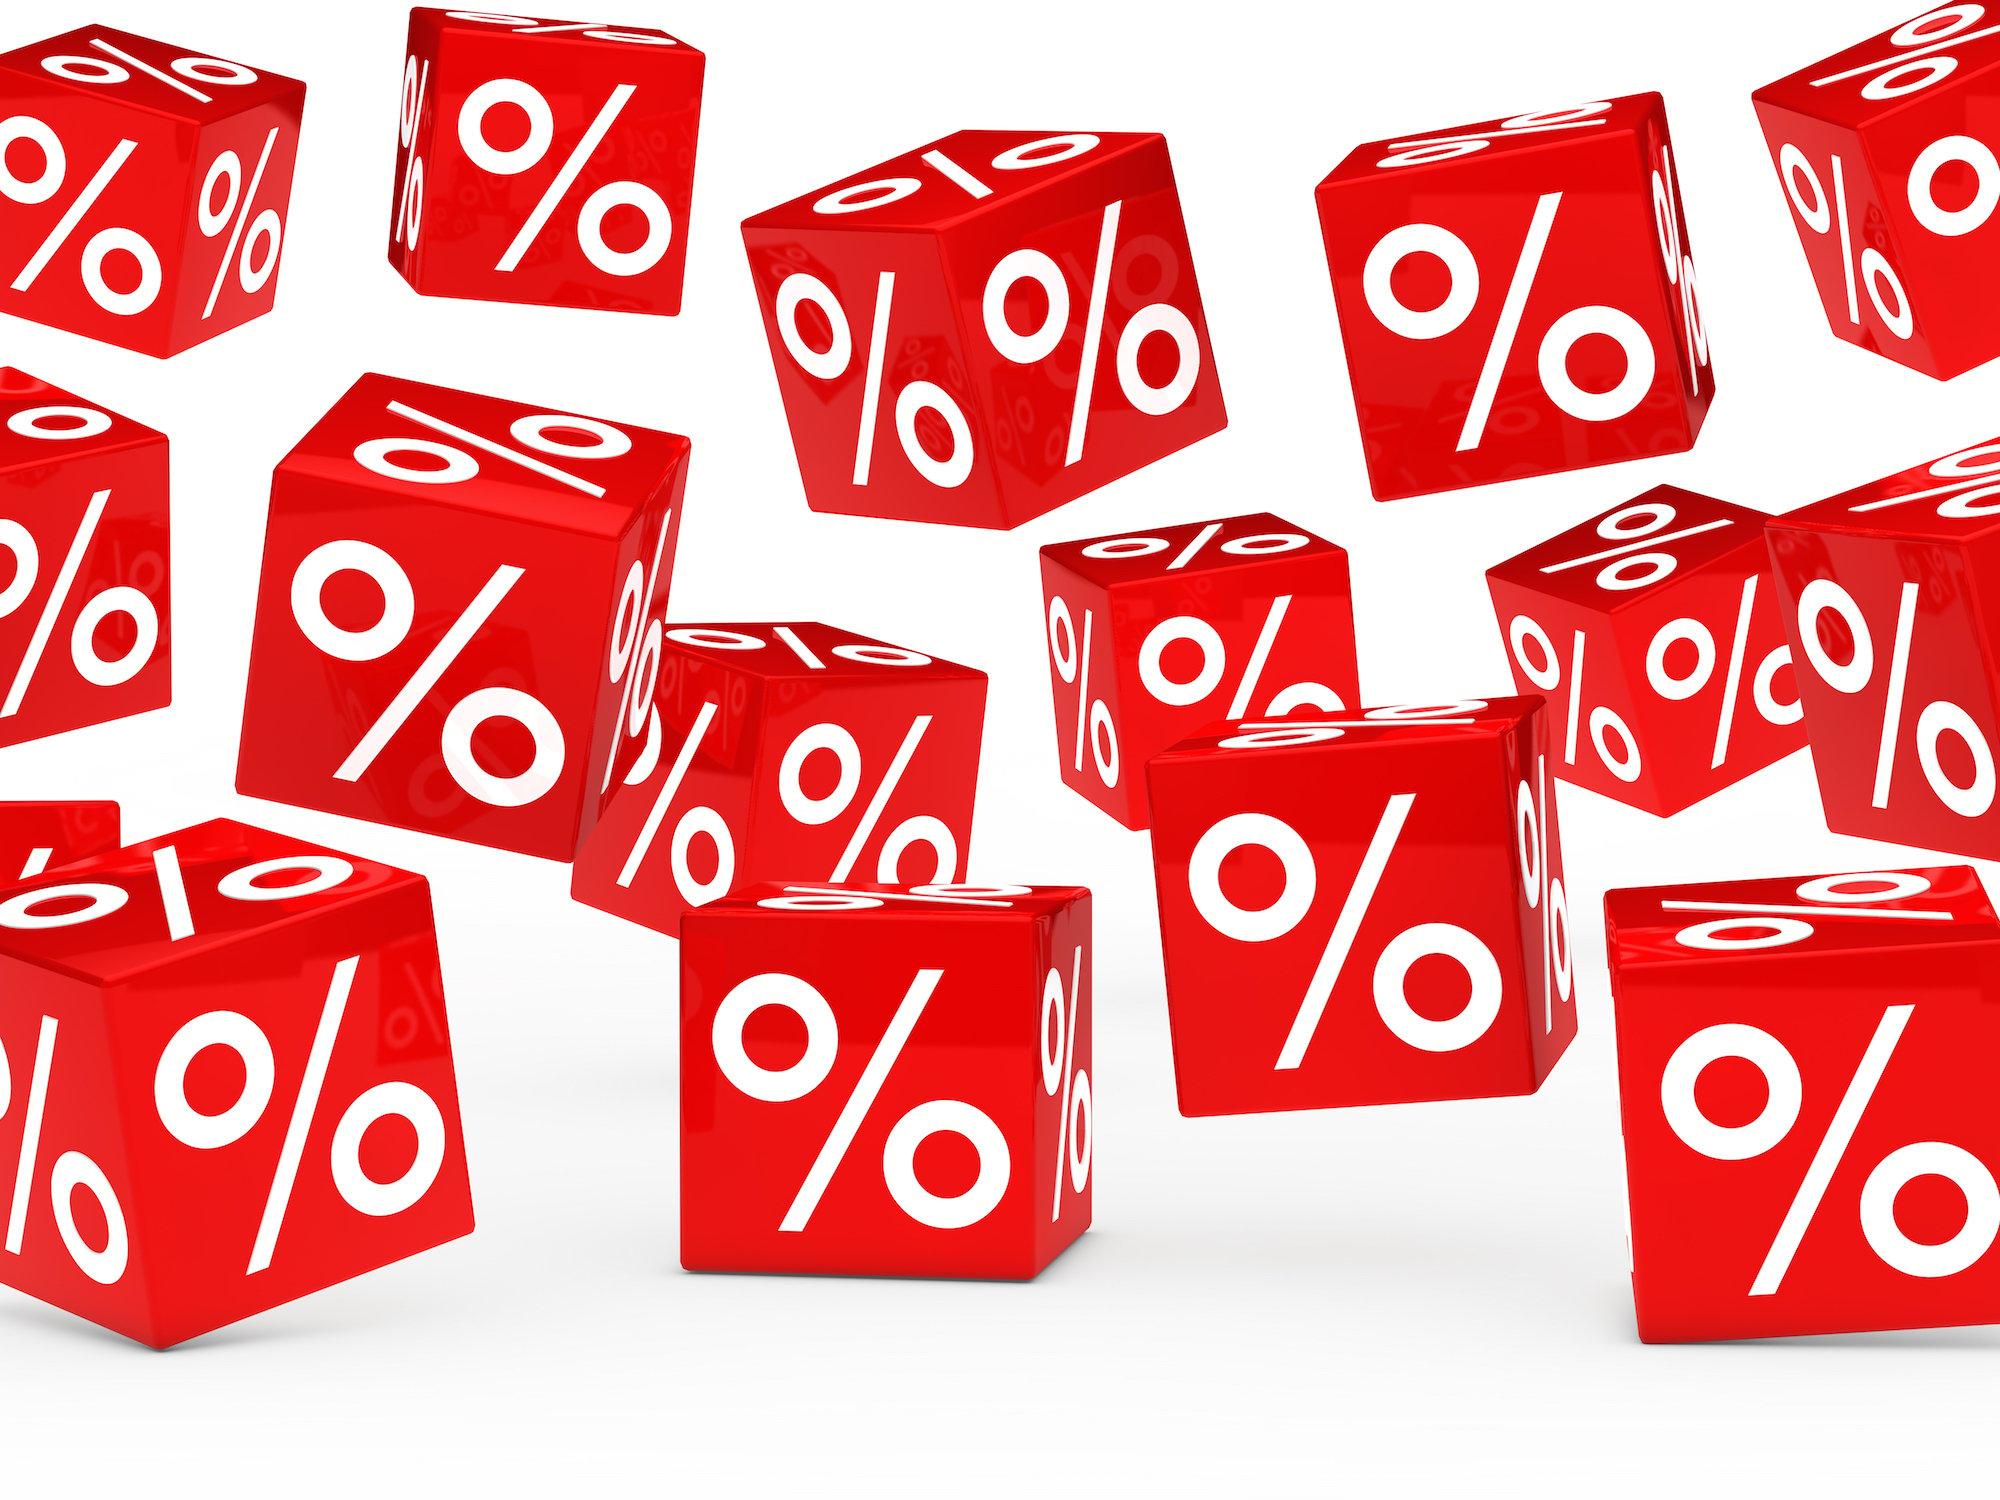 Interest rate percent